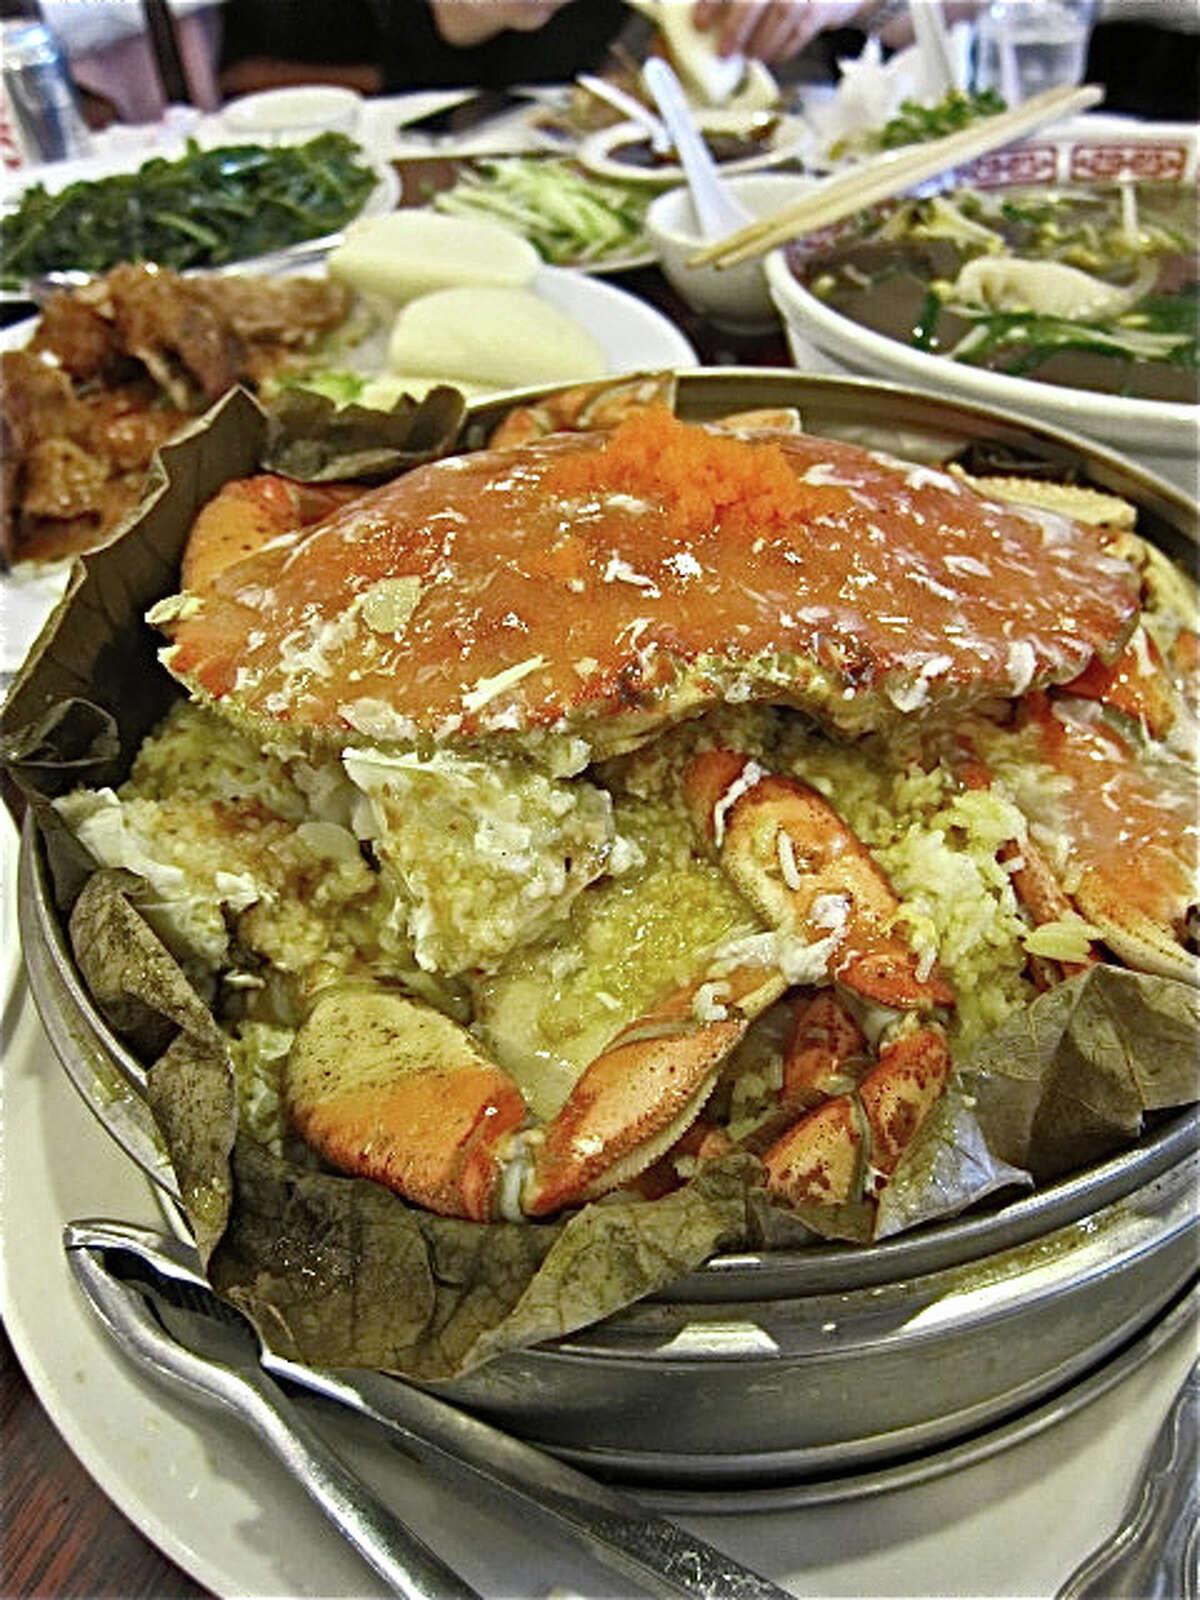 At Confucius Seafood: Dungeness crab in lotus leaf.